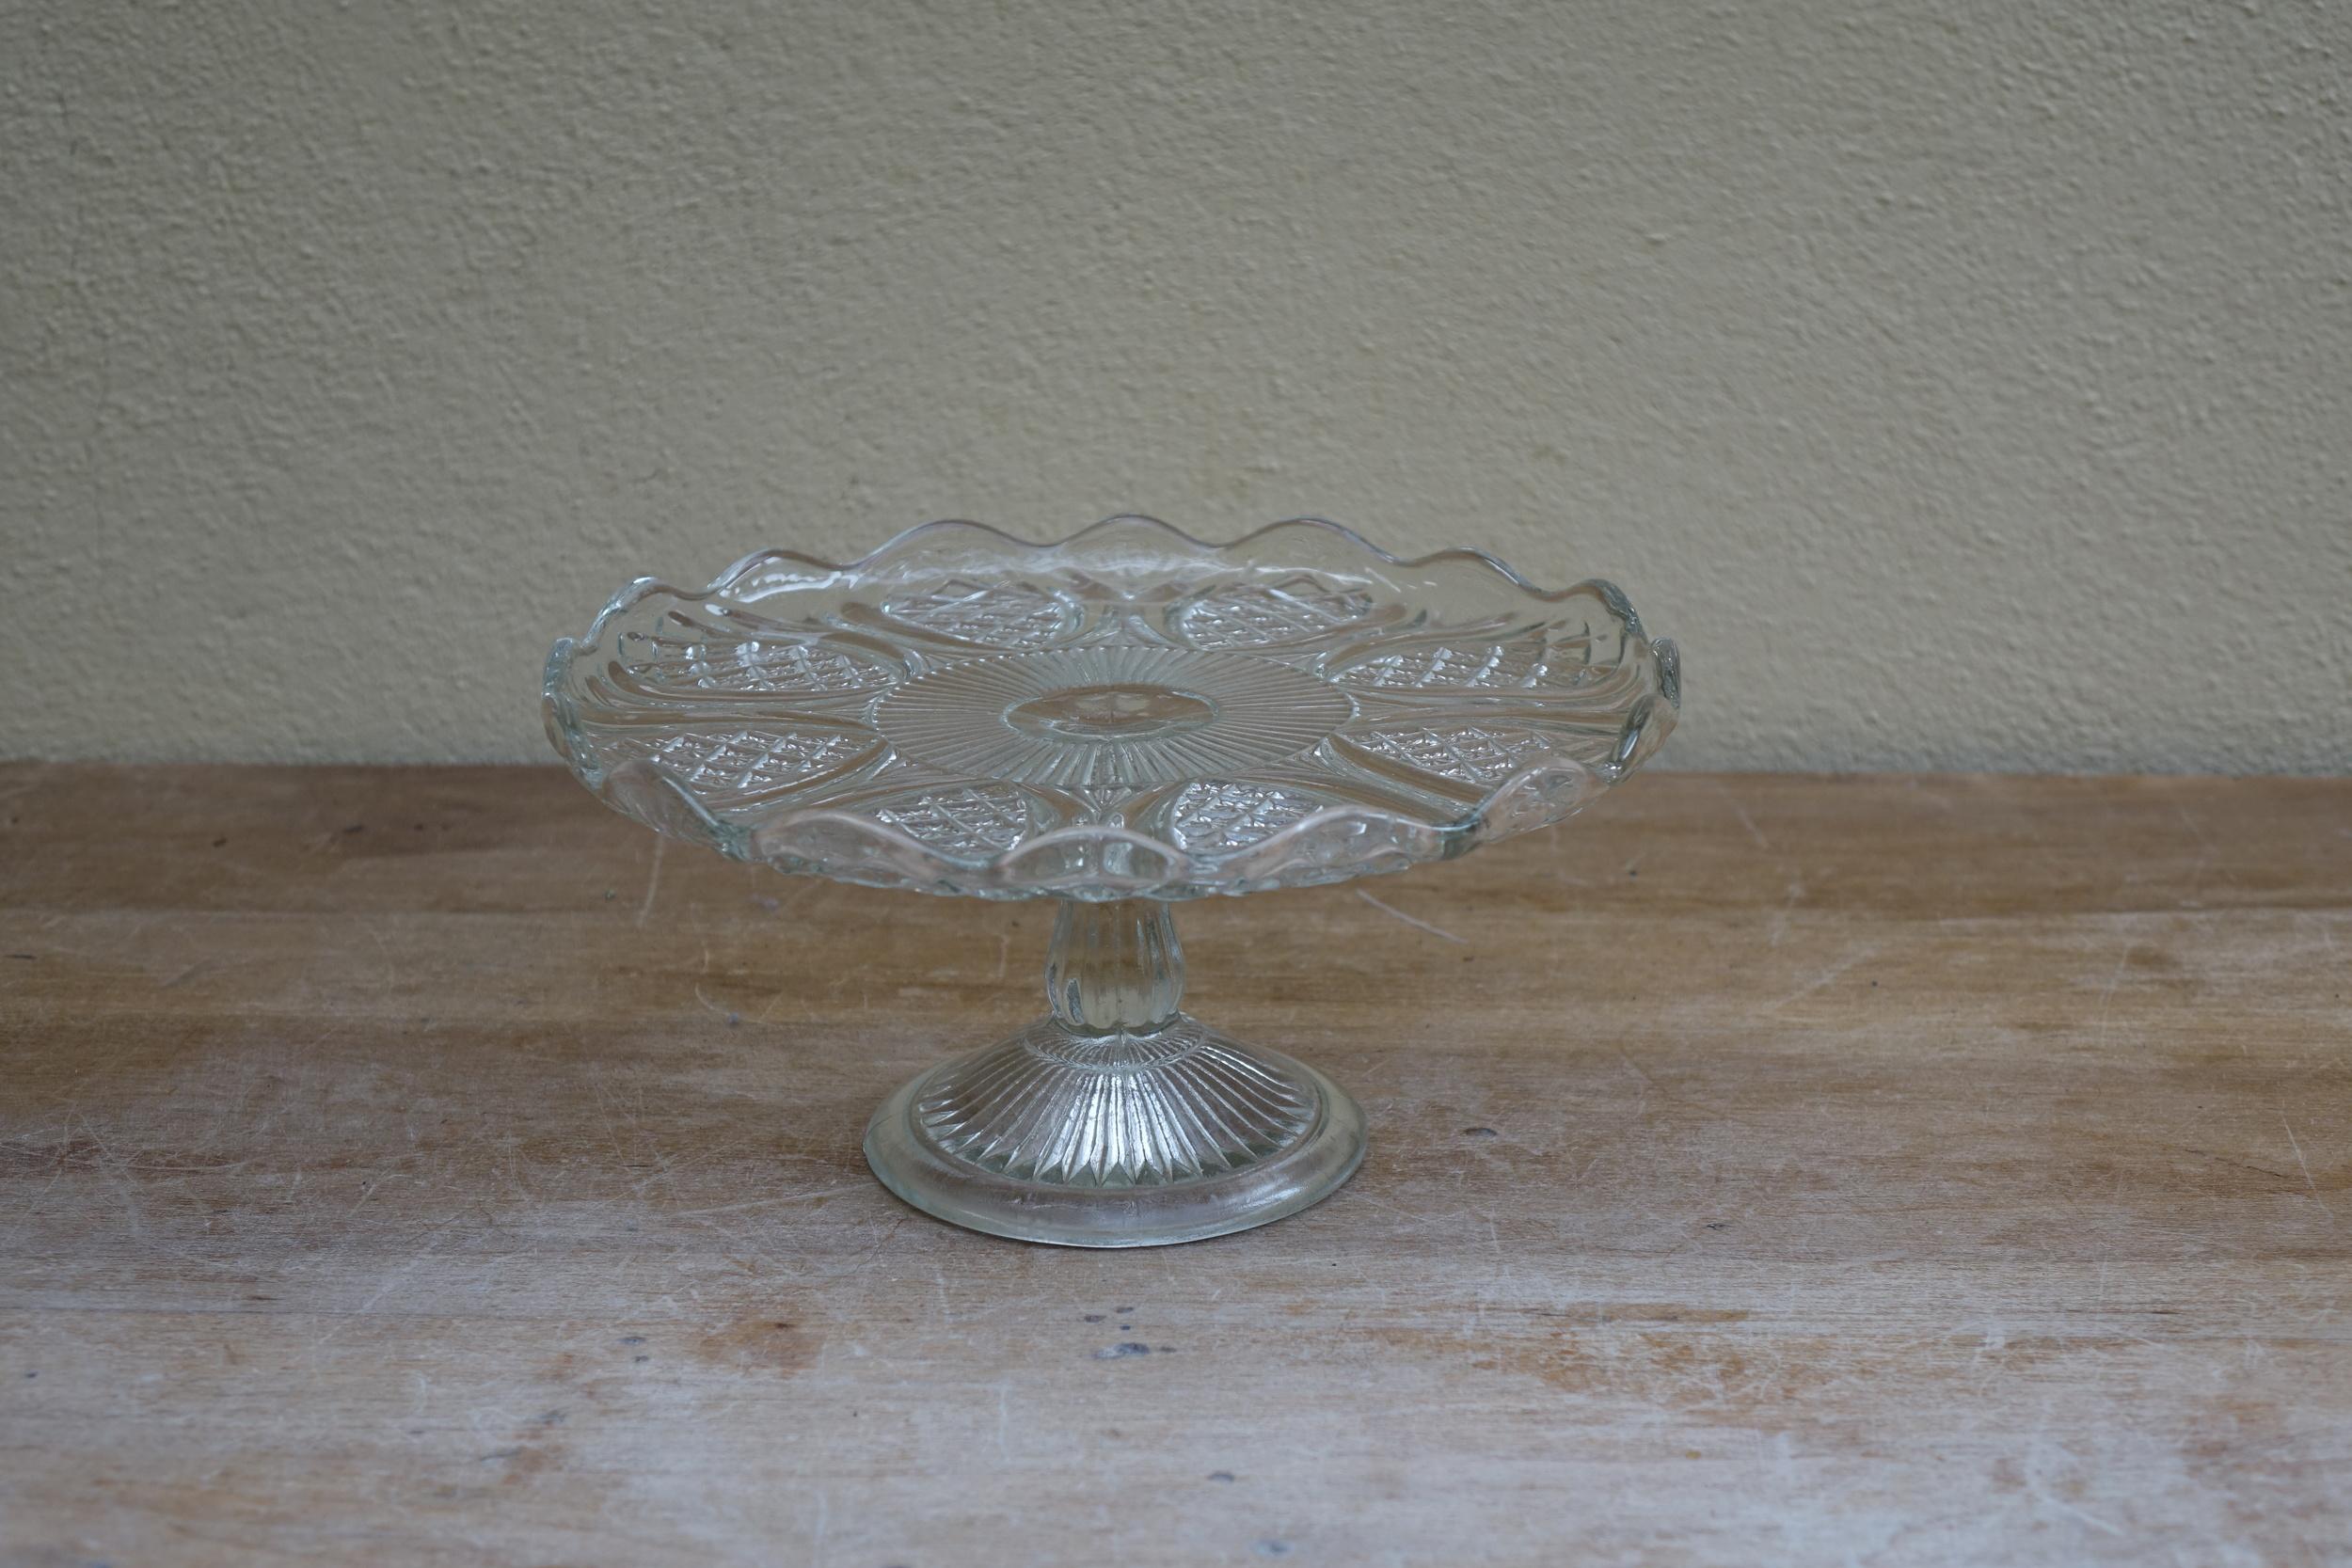 Vintage Glass Cake Stand £3